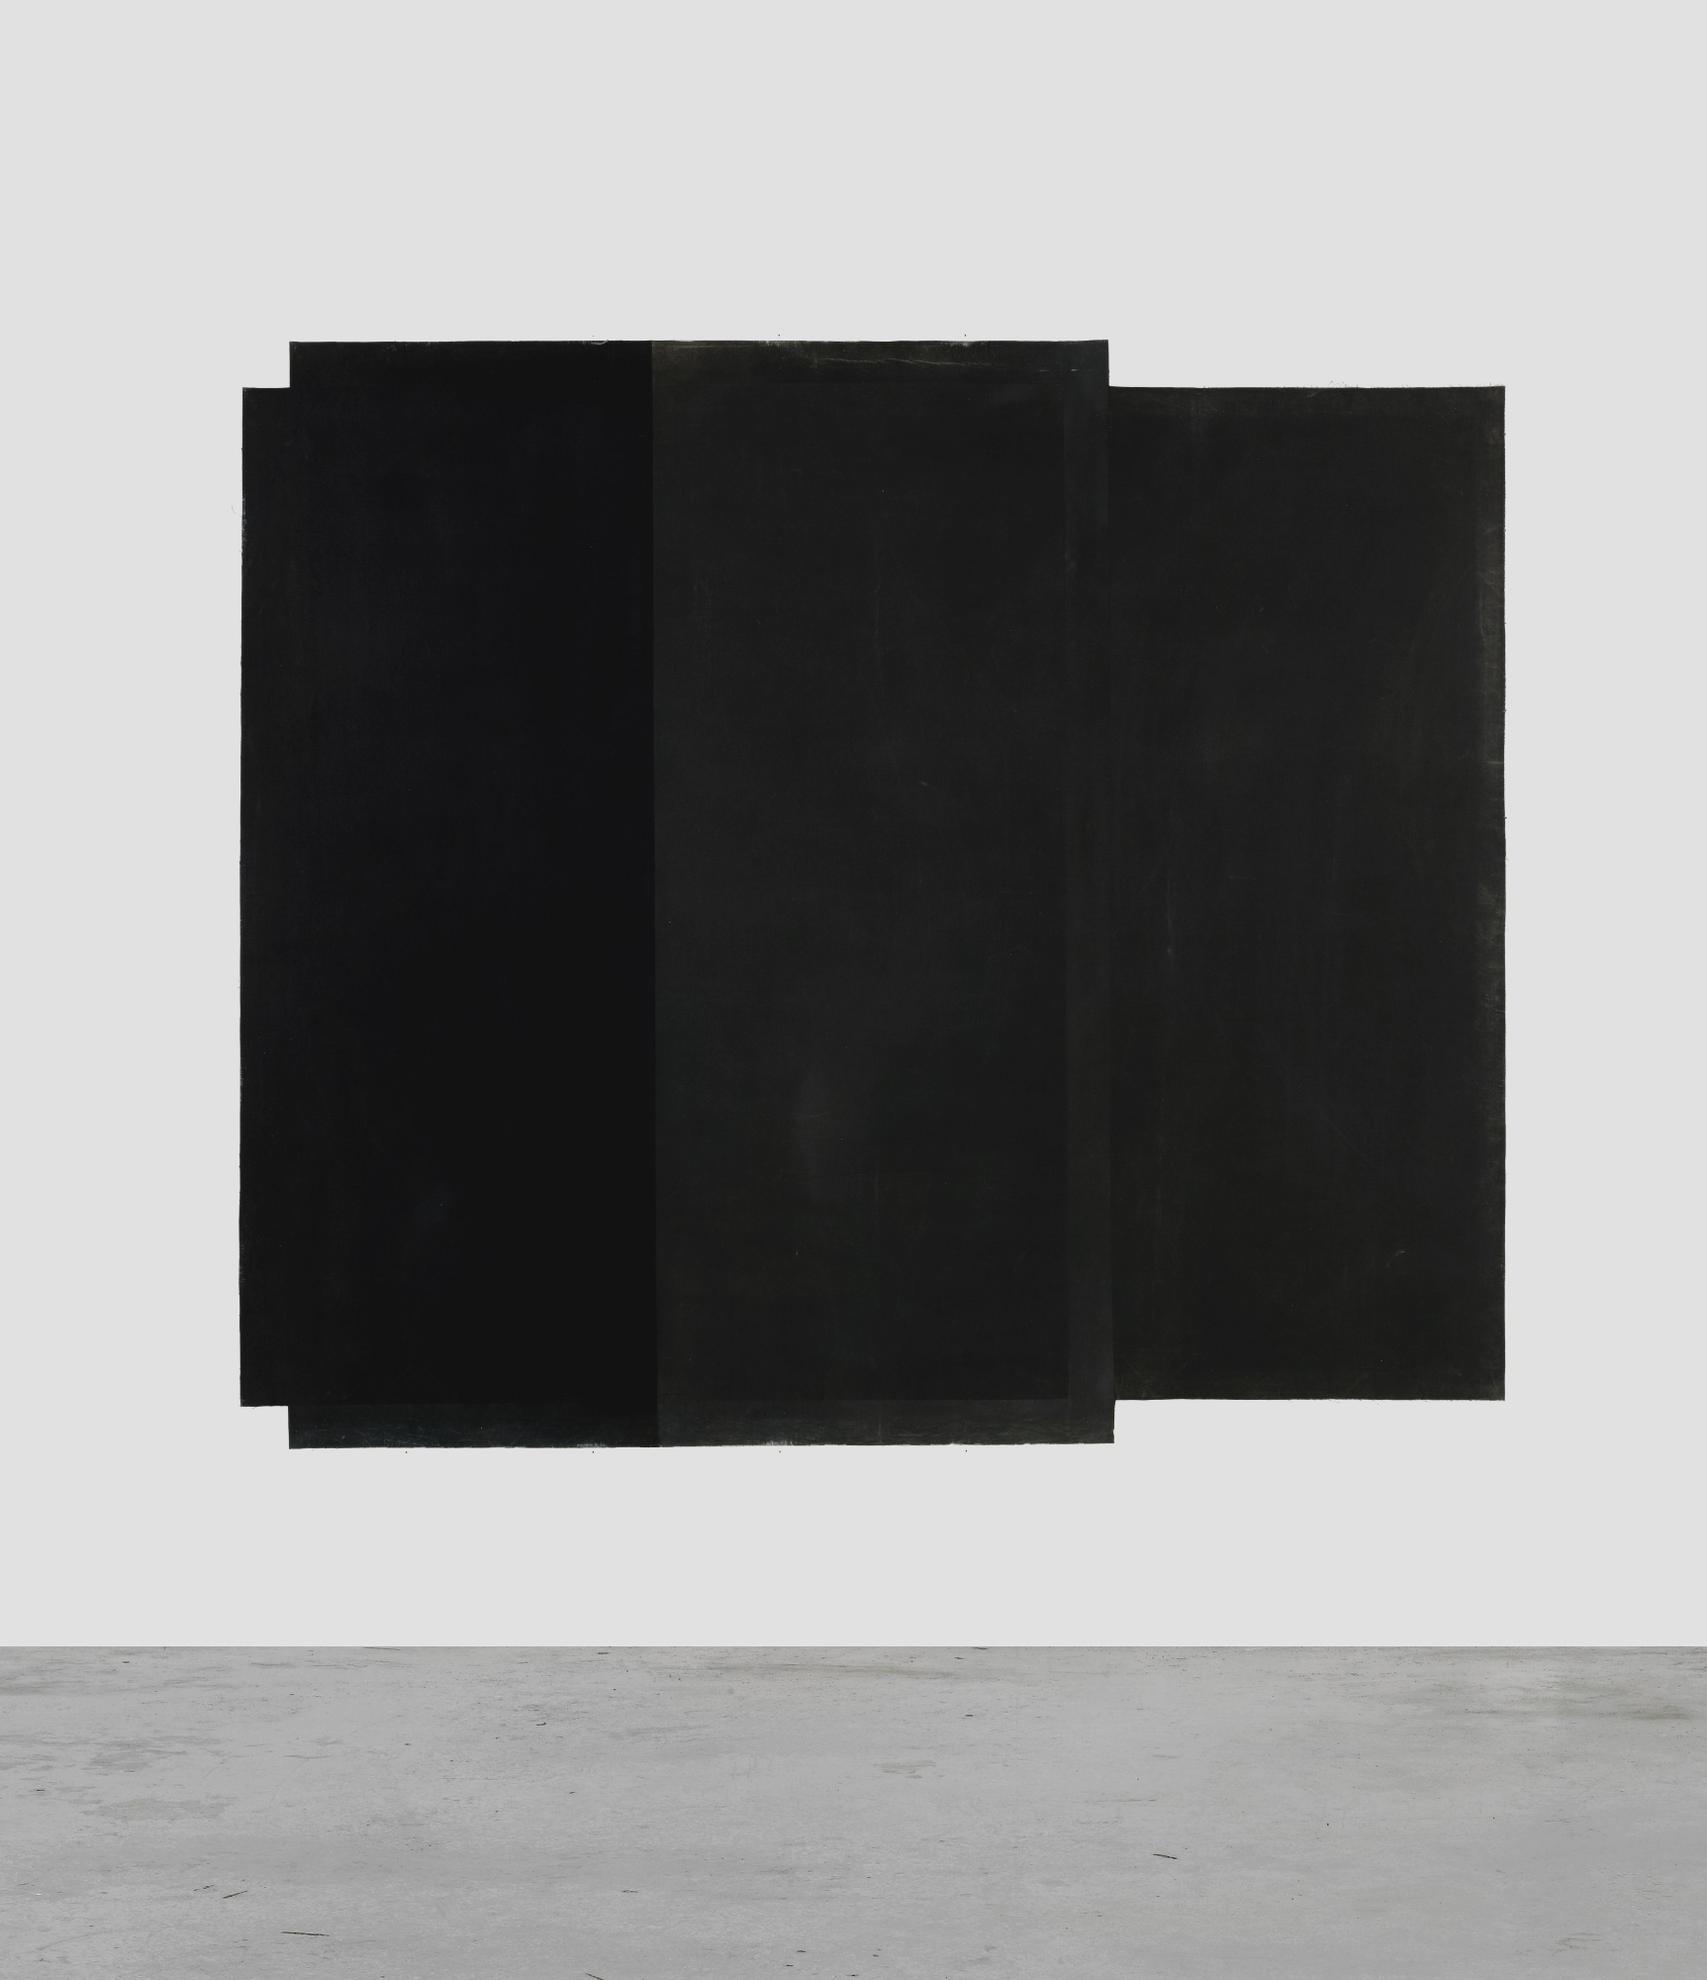 Louis Cane-Sol-Mur-1976